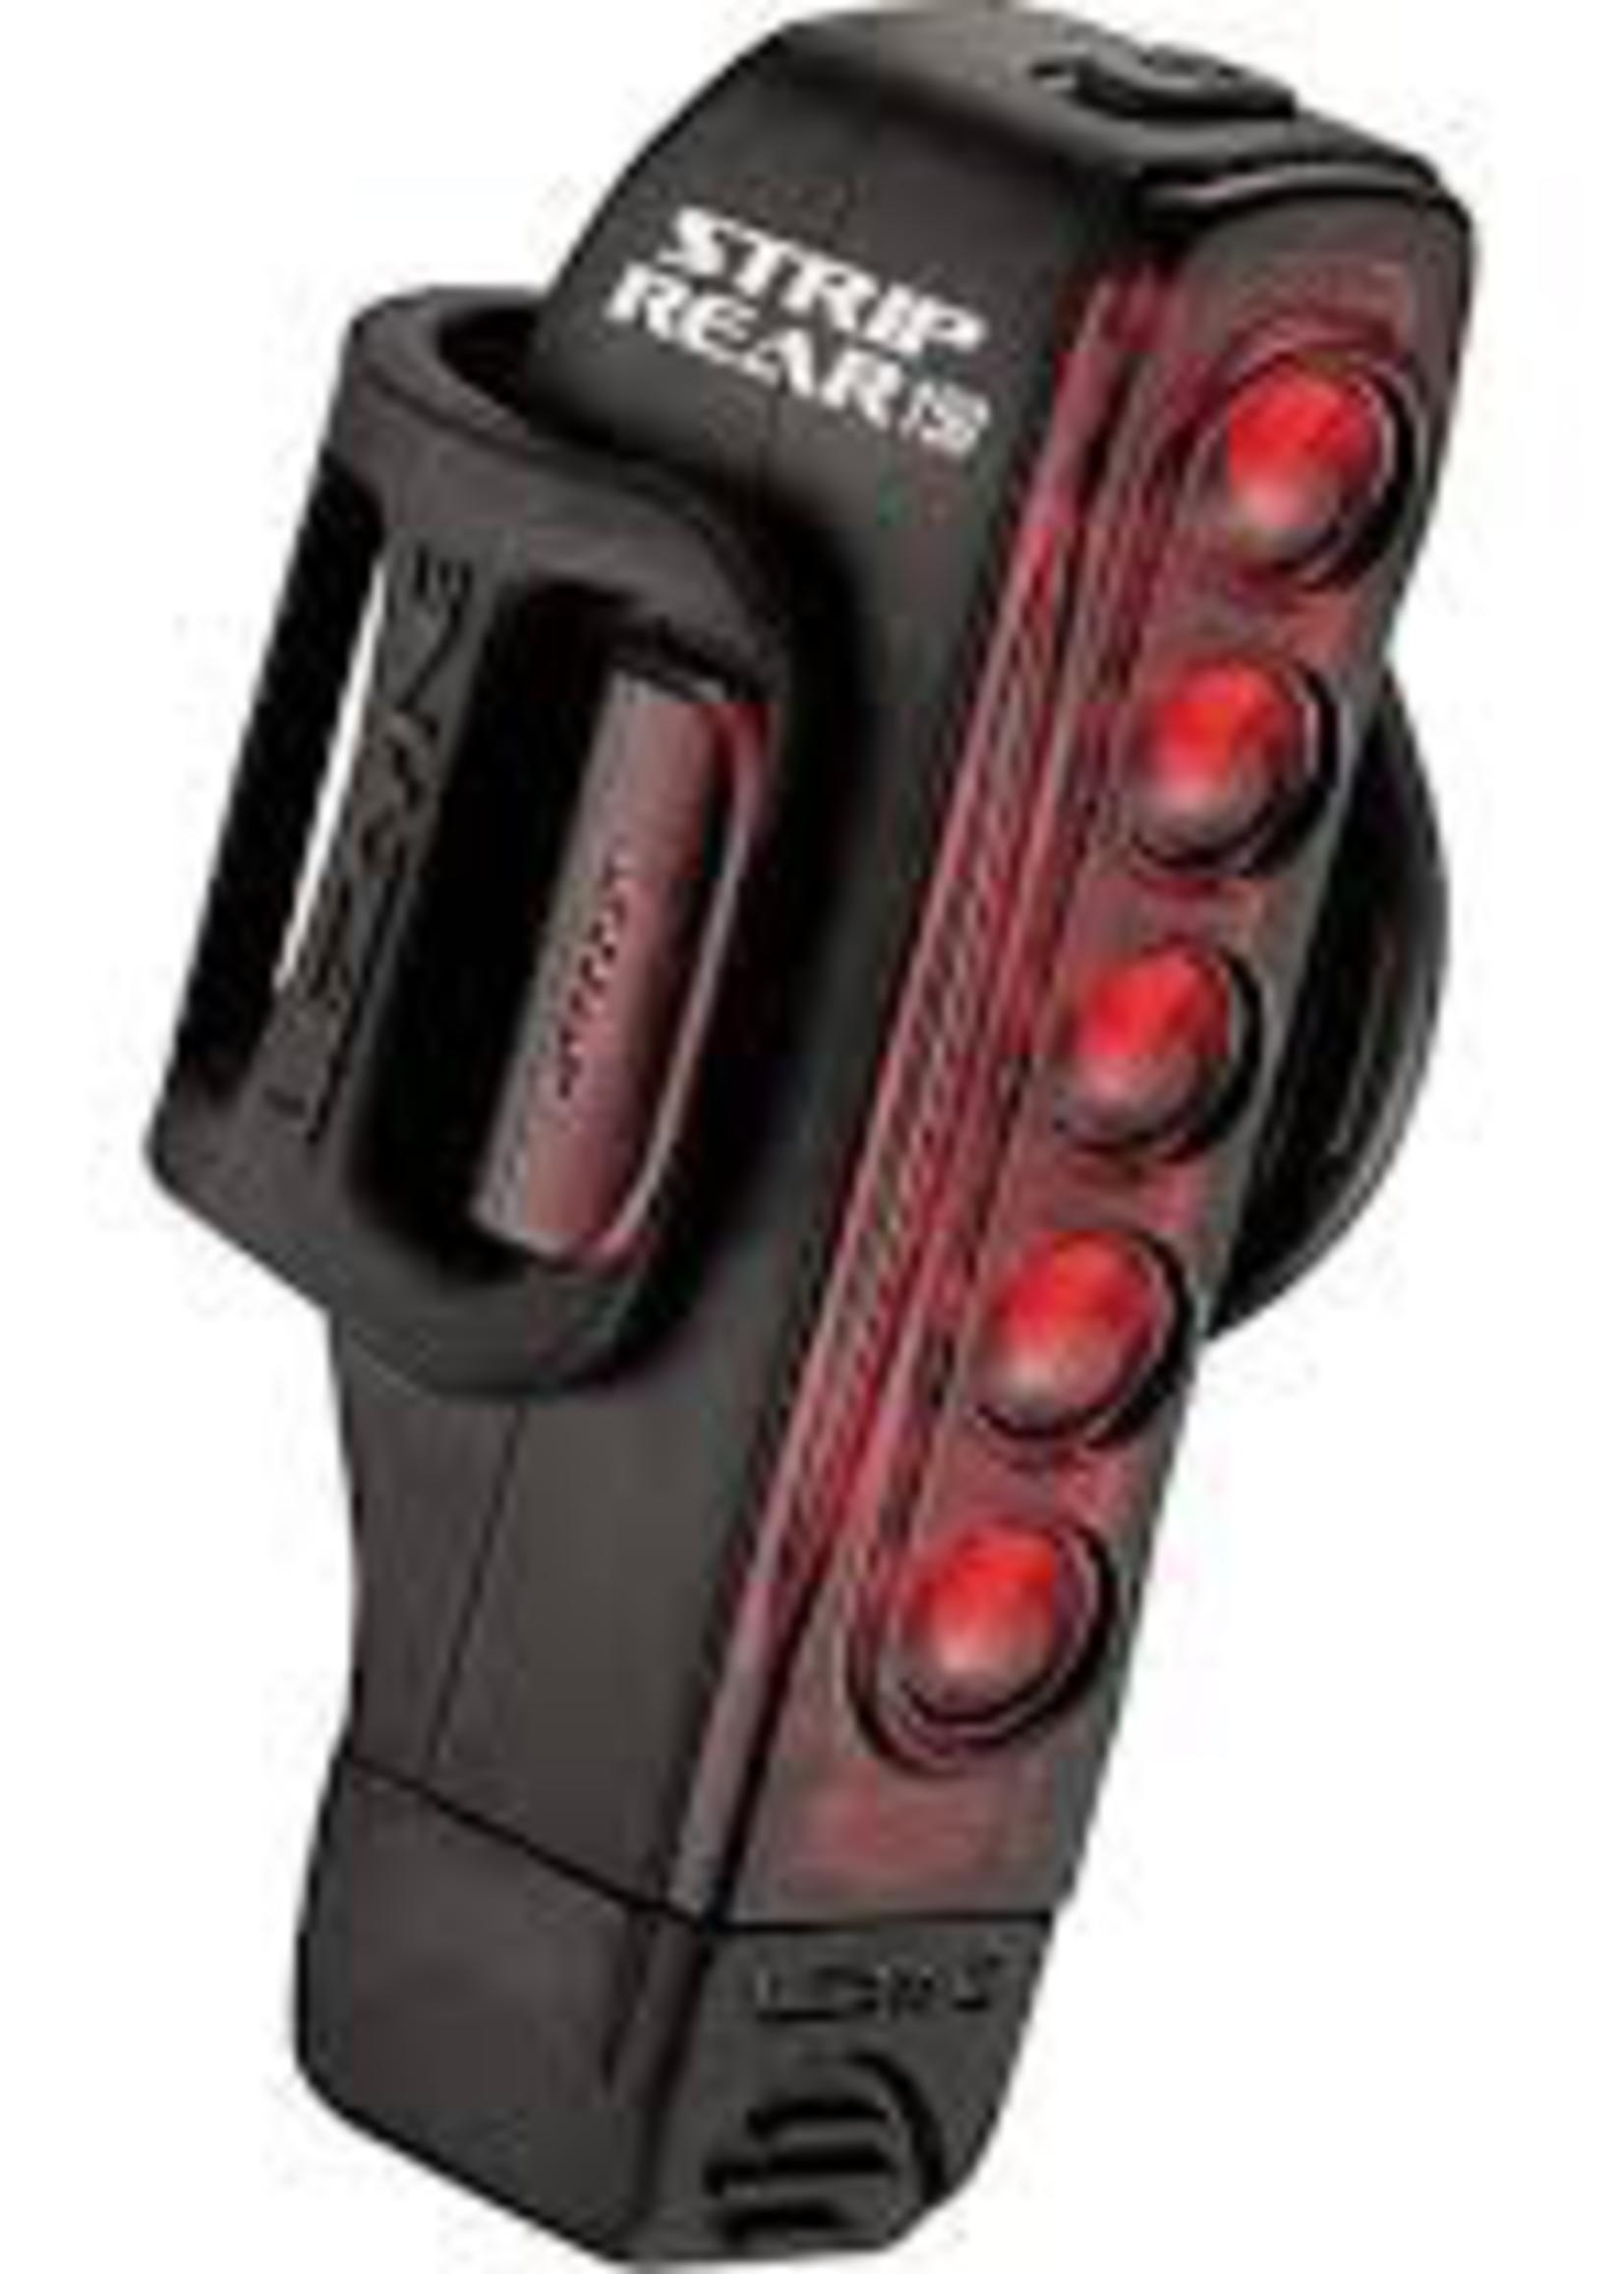 LEZYNE - STRIP DRIVE, LIGHT, REAR 150 lumens